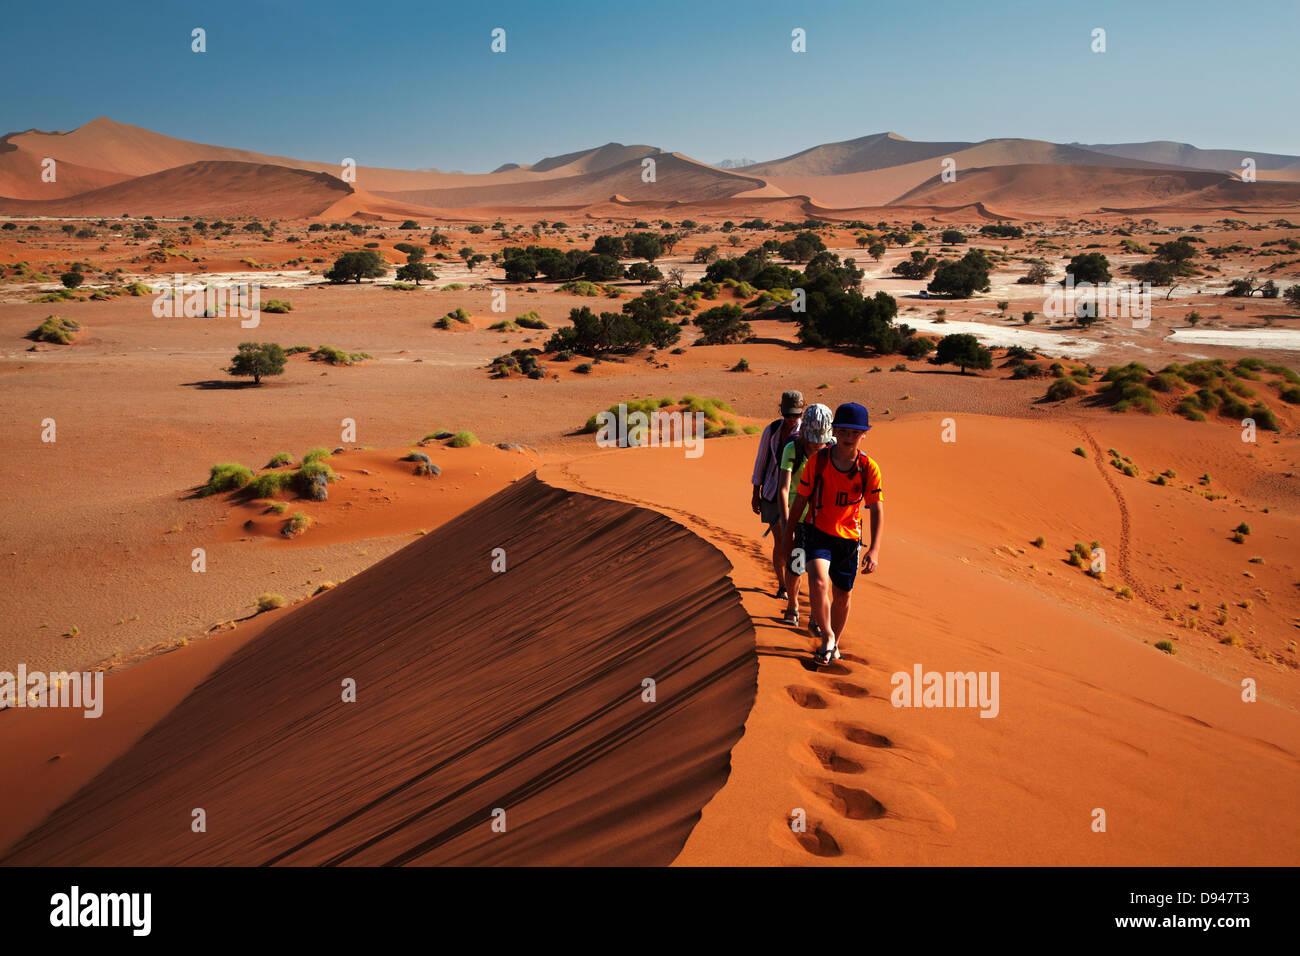 Family climbing sand dune at Sossusvlei, Namib-Naukluft National Park, Namibia, Africa - Stock Image